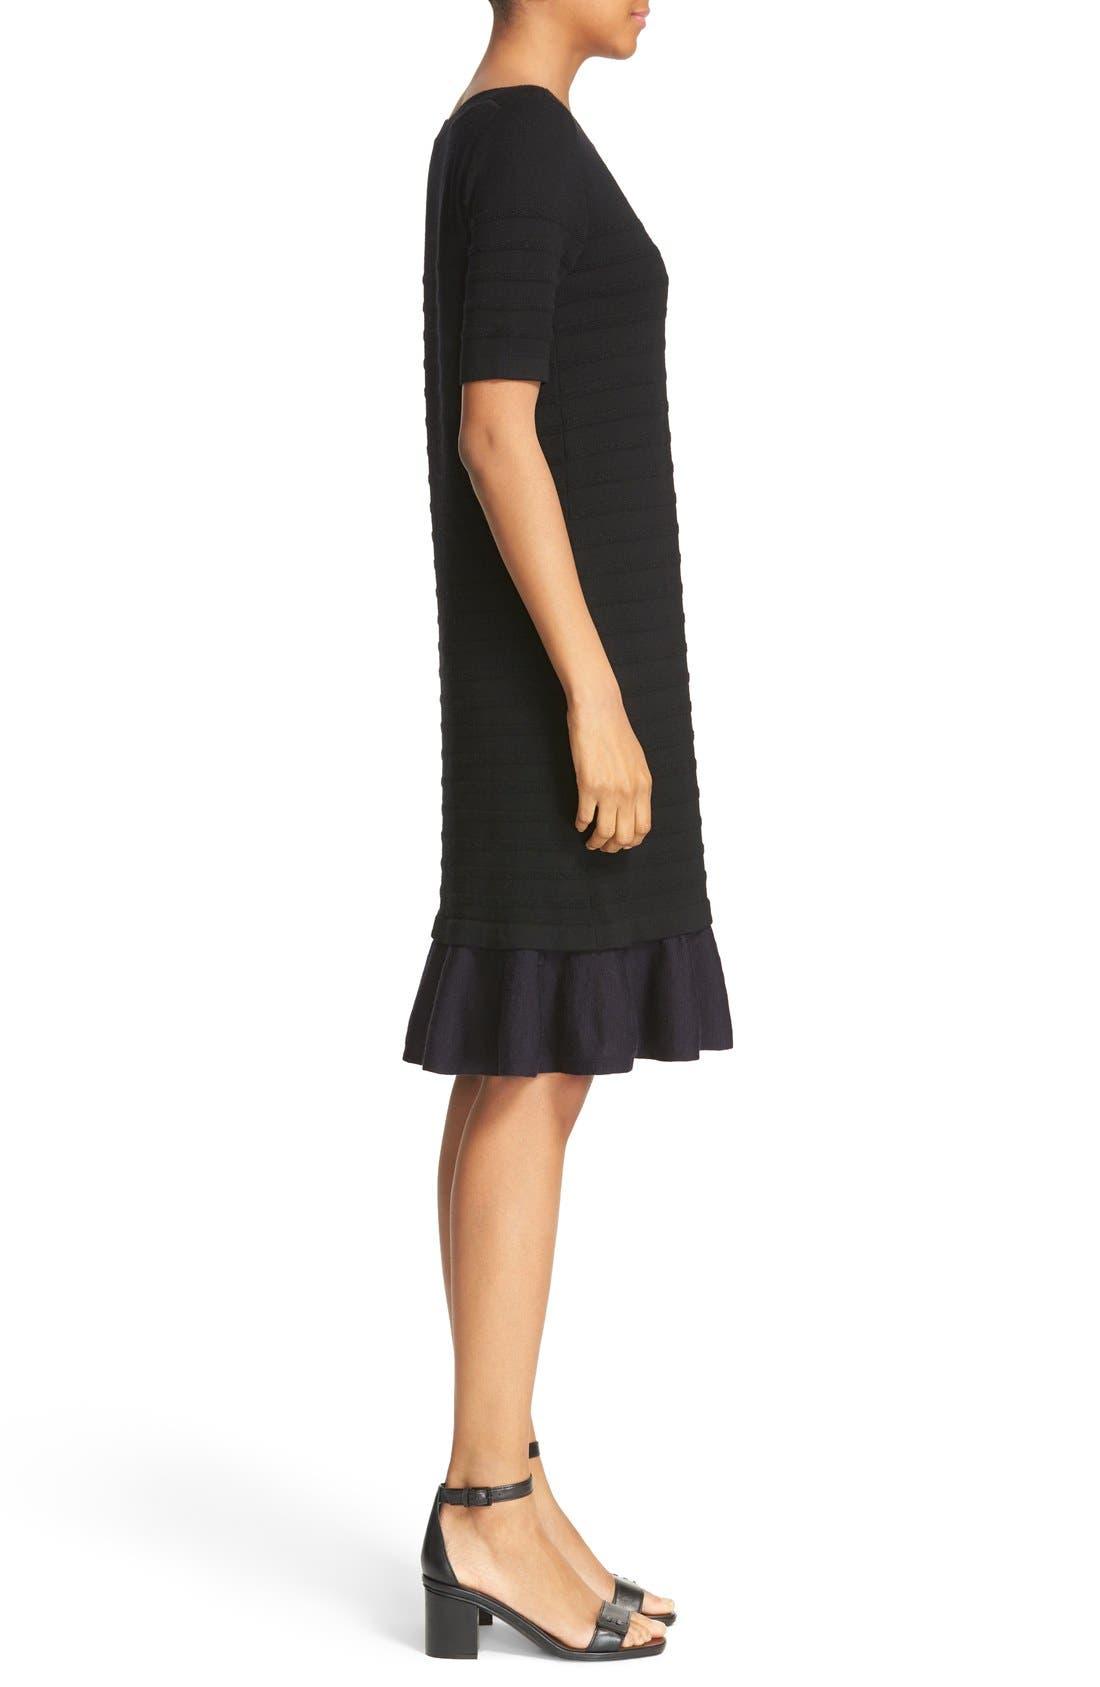 Alternate Image 3  - Tory Burch Giselle Textured Merino Wool Sweater Dress